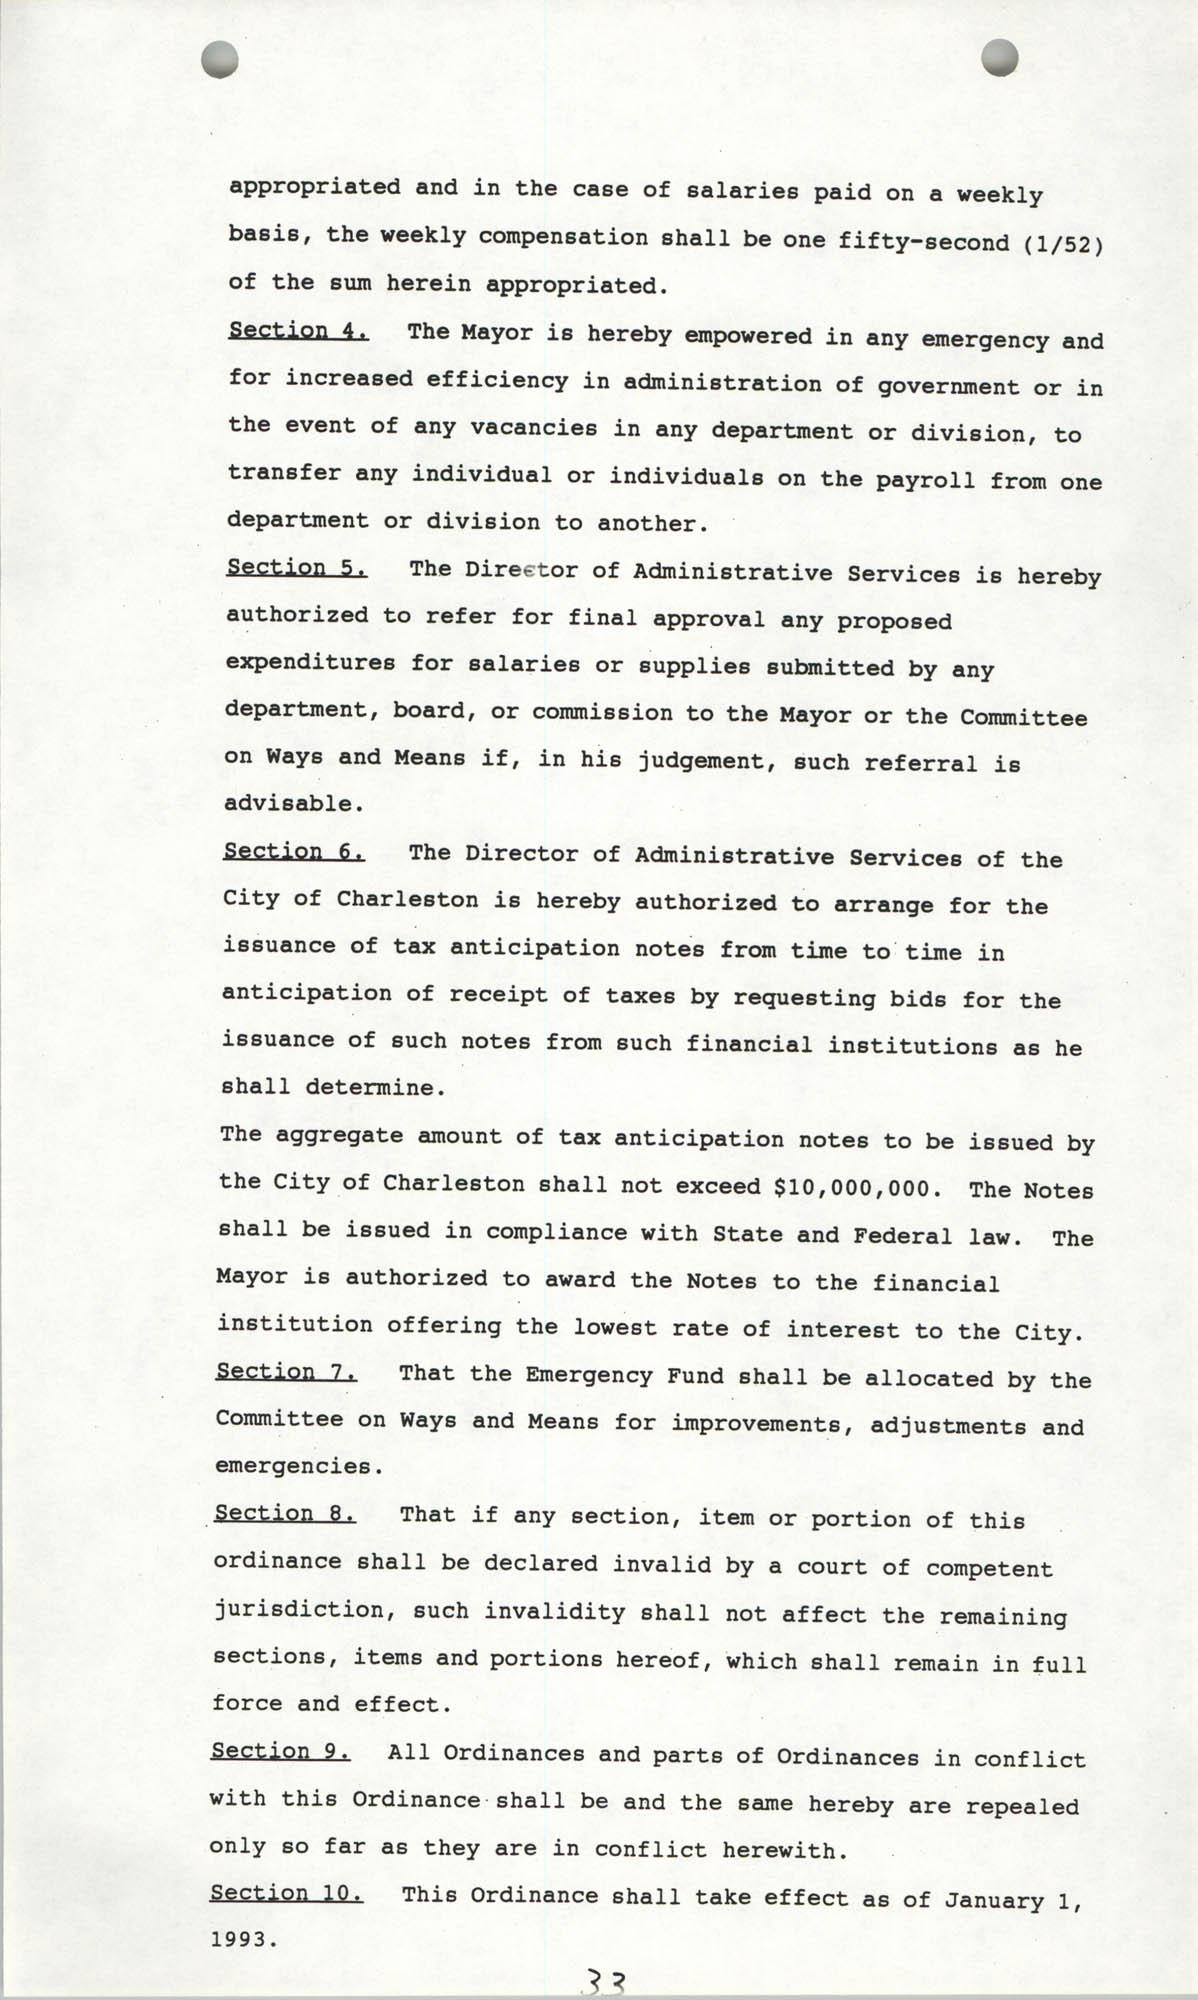 The City Council of Charleston, South Carolina, 1993 Budget, Page 33